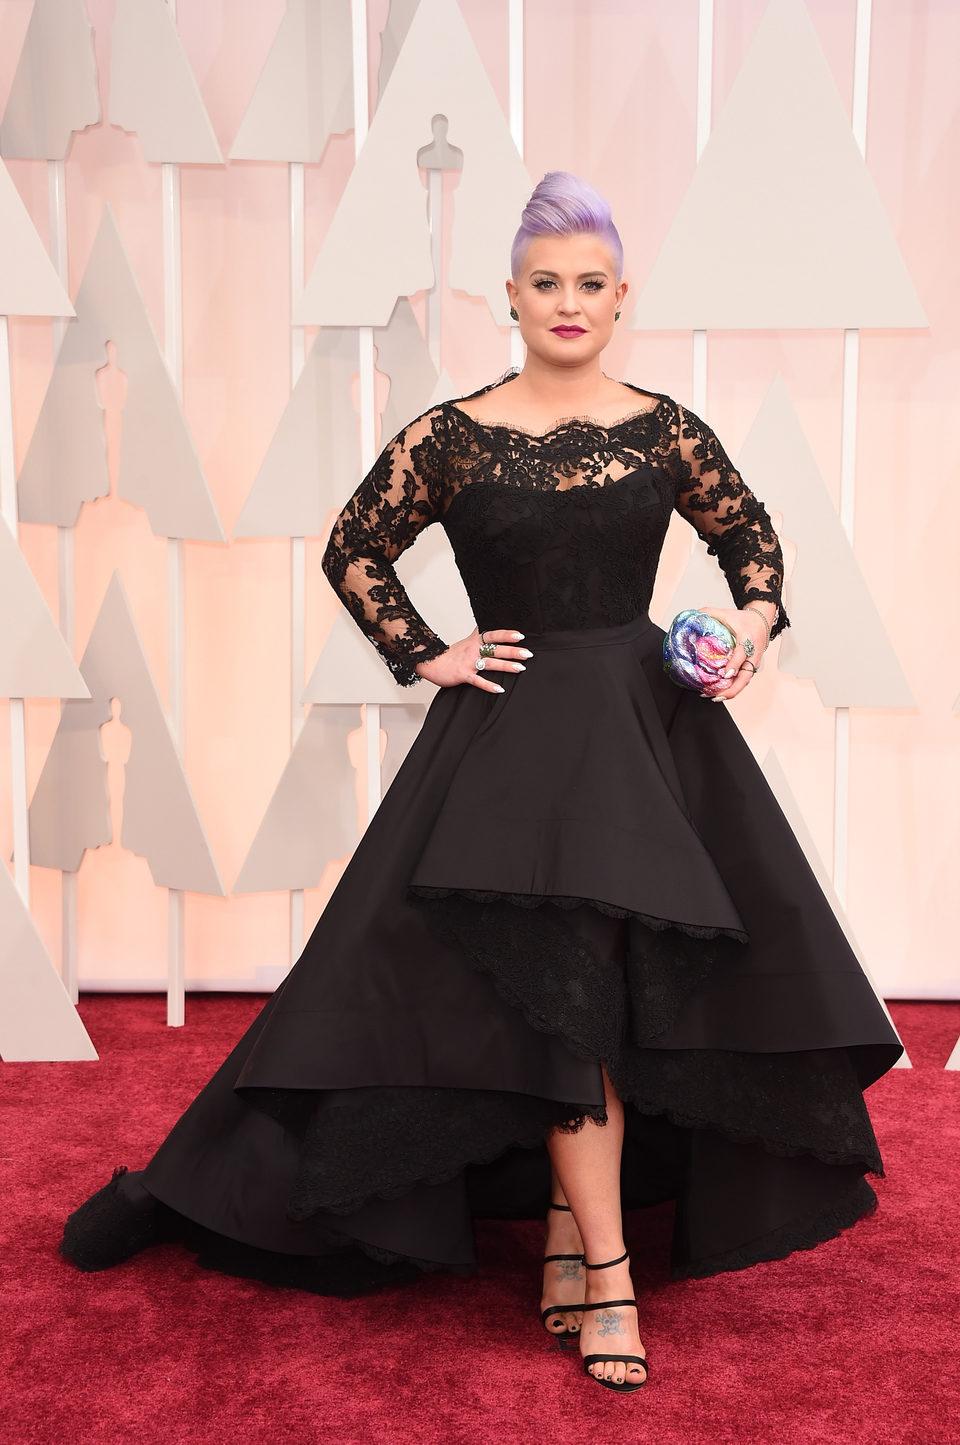 Kelly Osbourne at the Oscar 2015 red carpet